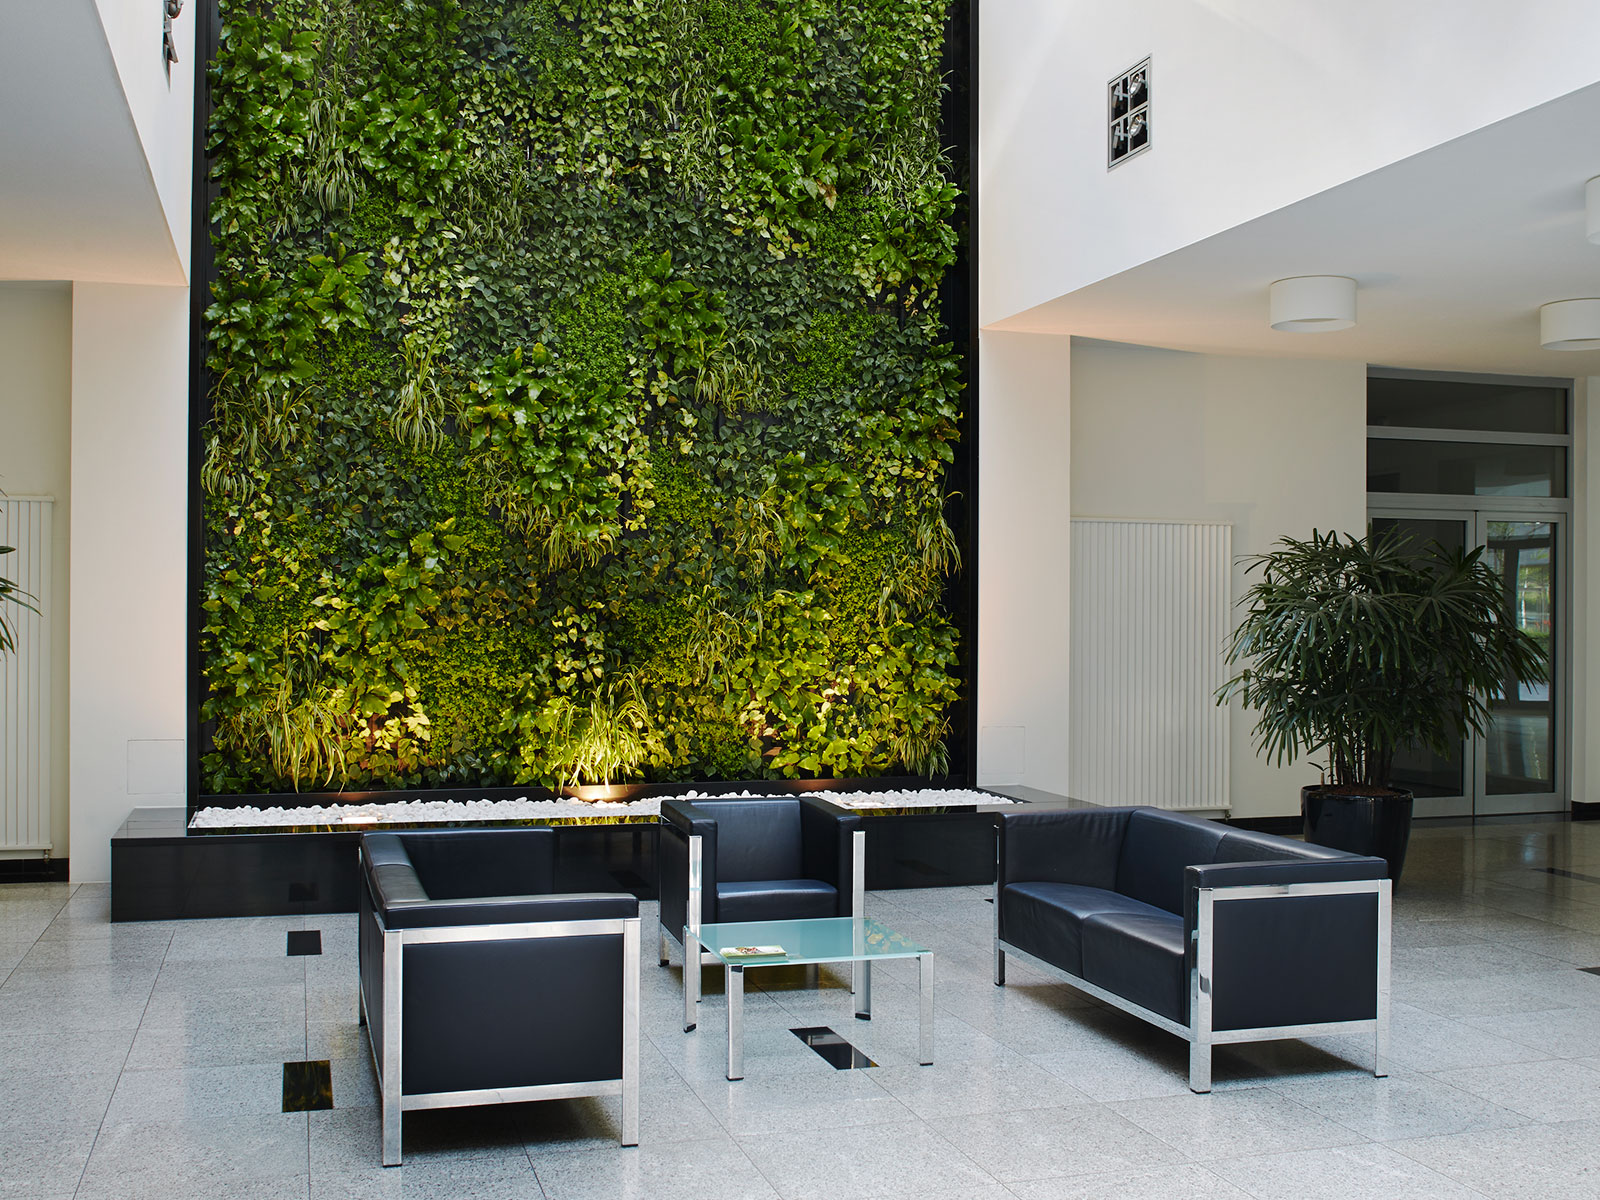 atrium der axa gmbh co kg frankfurt hydroflora gmbh. Black Bedroom Furniture Sets. Home Design Ideas